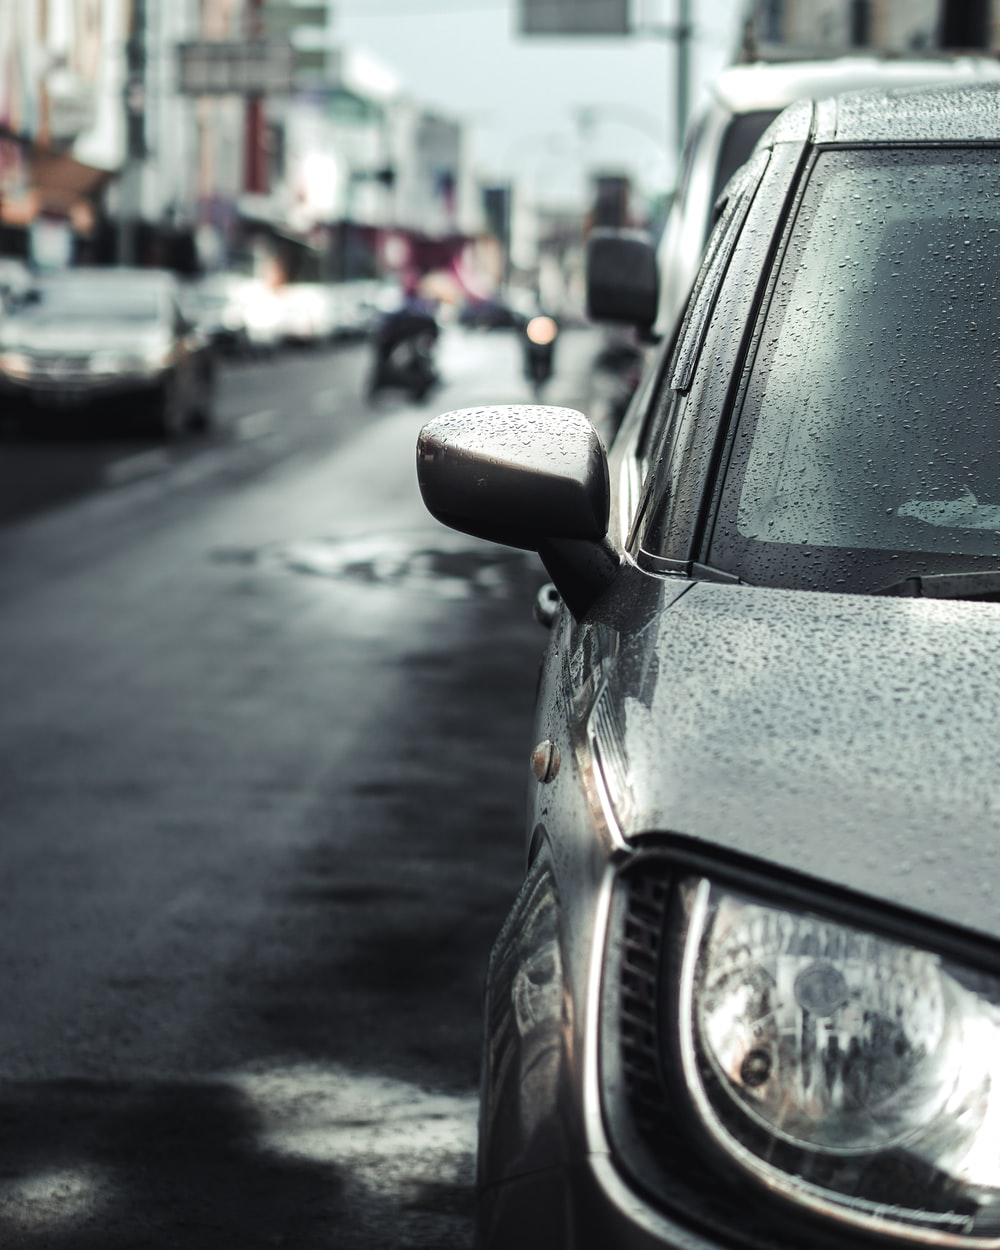 black car on the street during daytime